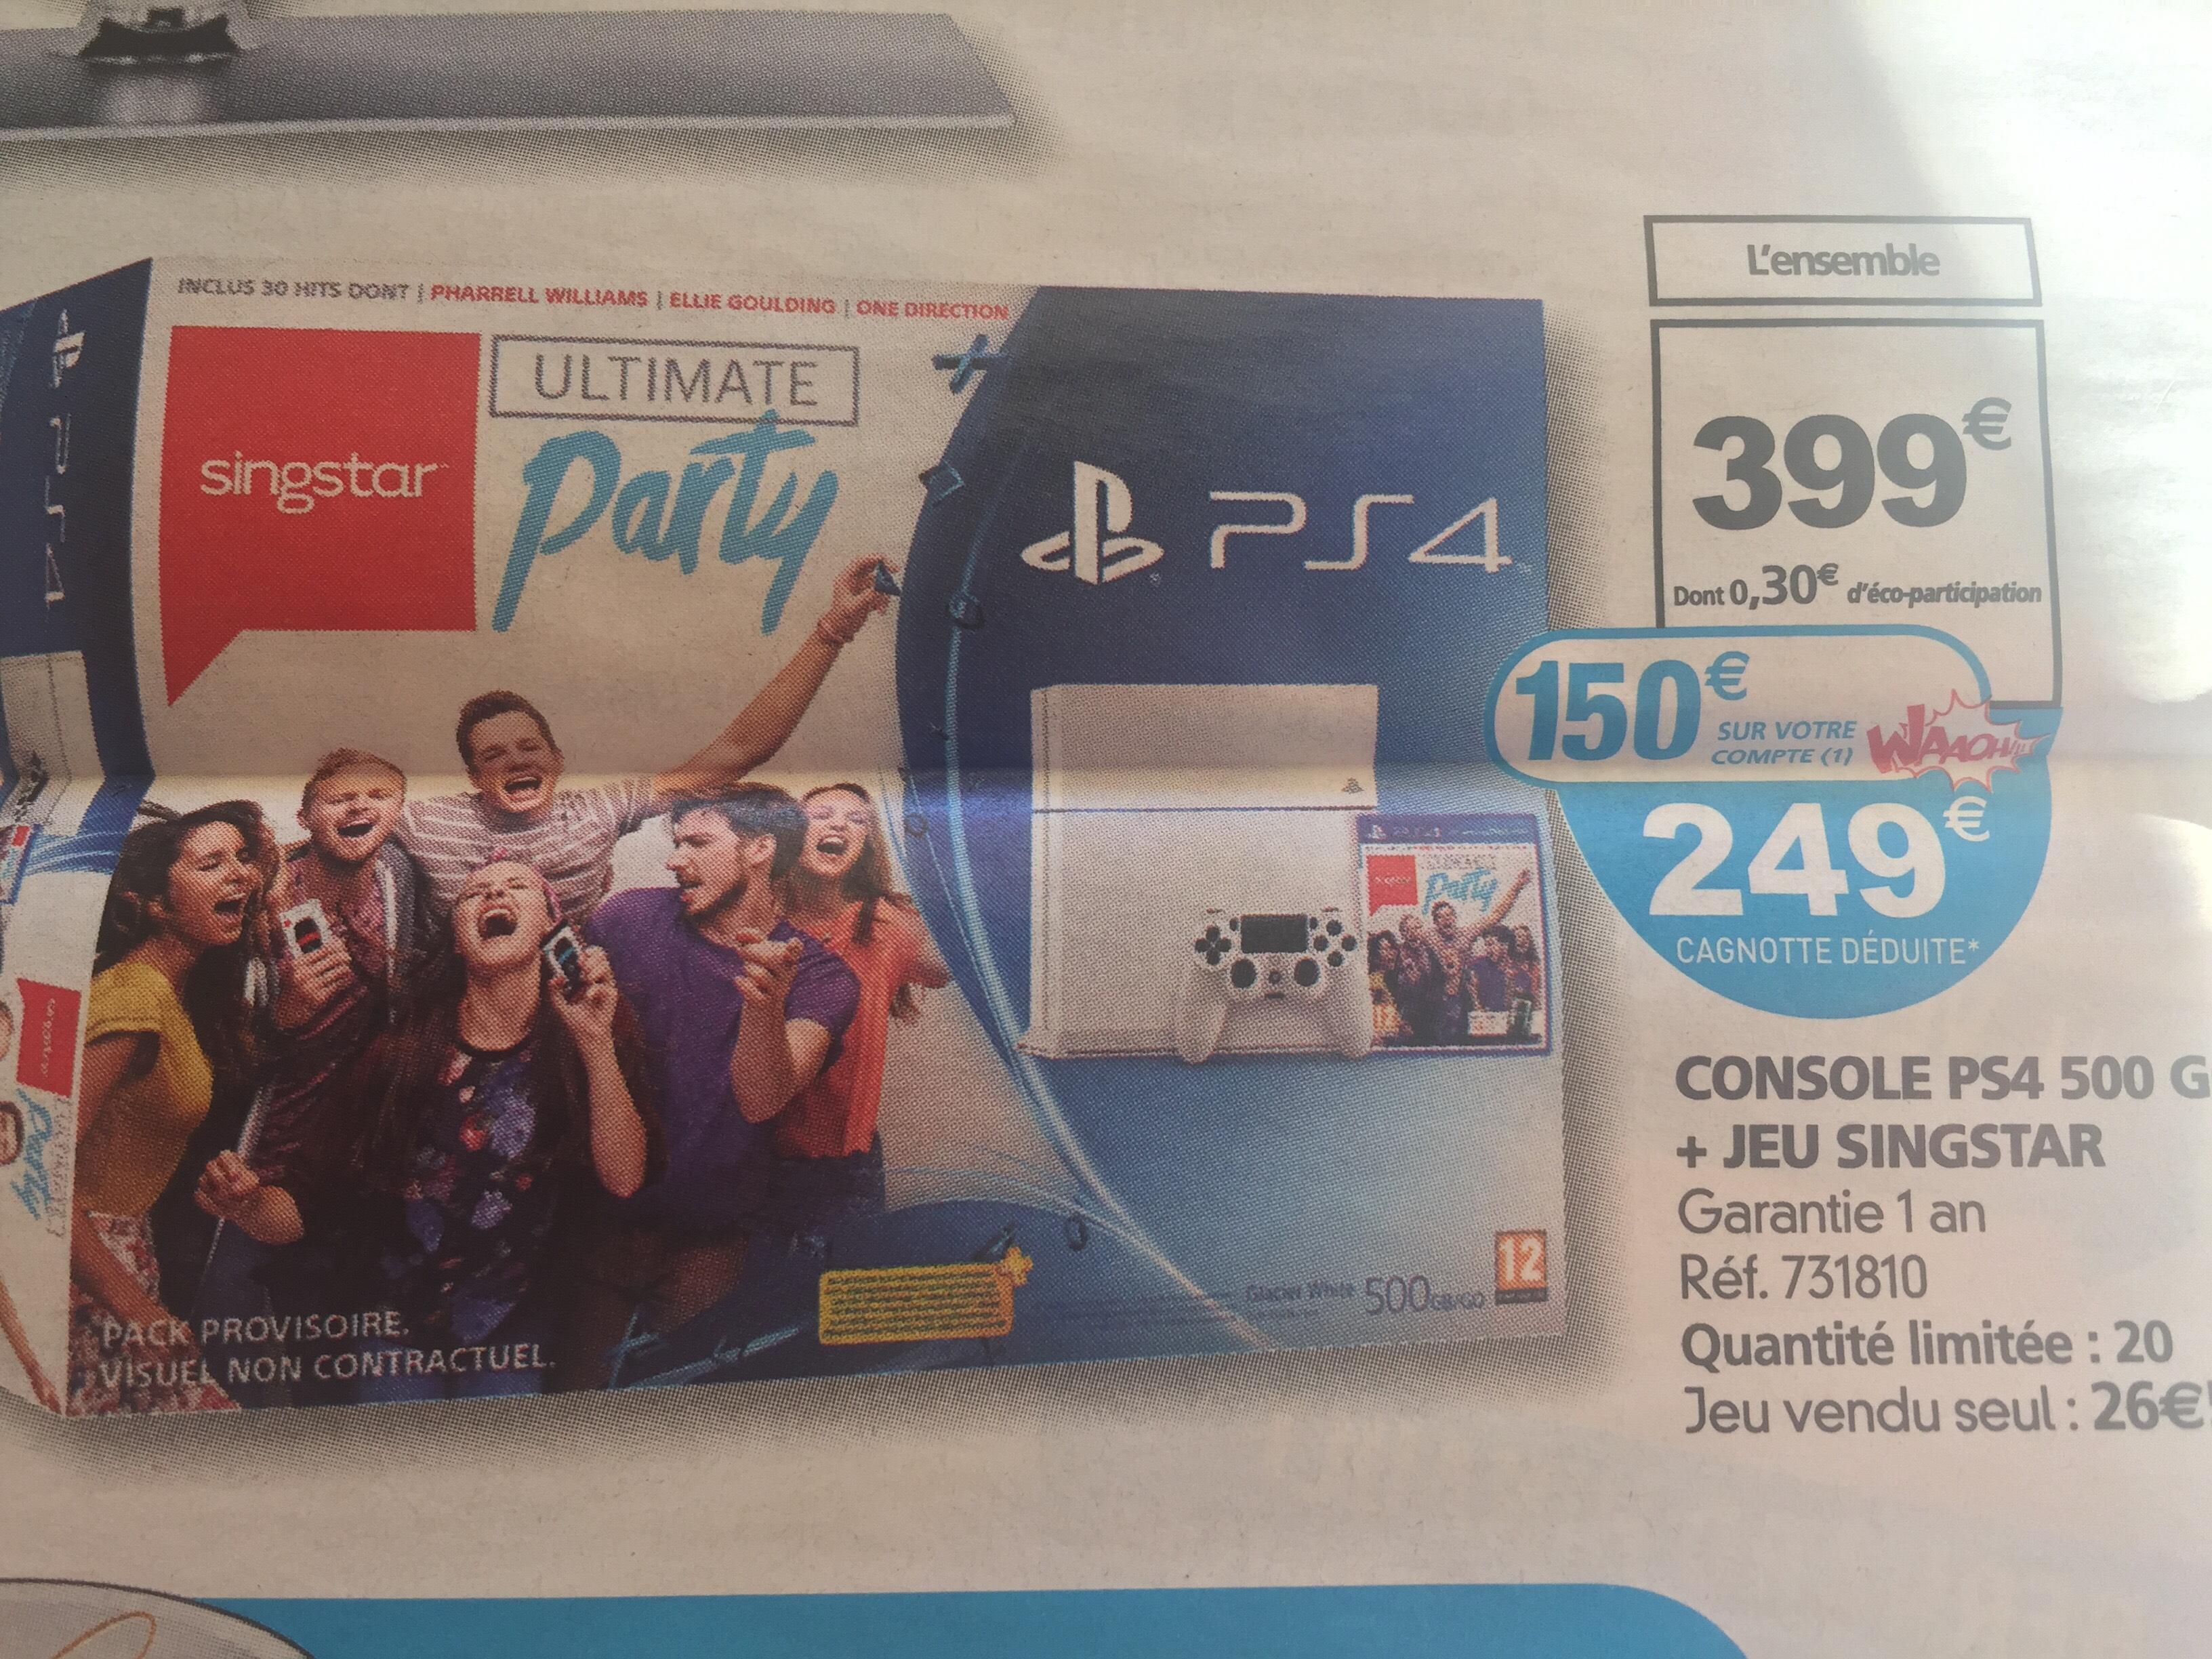 Pack Console Sony PS4 500 Go blanche + Singstar (150€ sur la carte Waaoh)